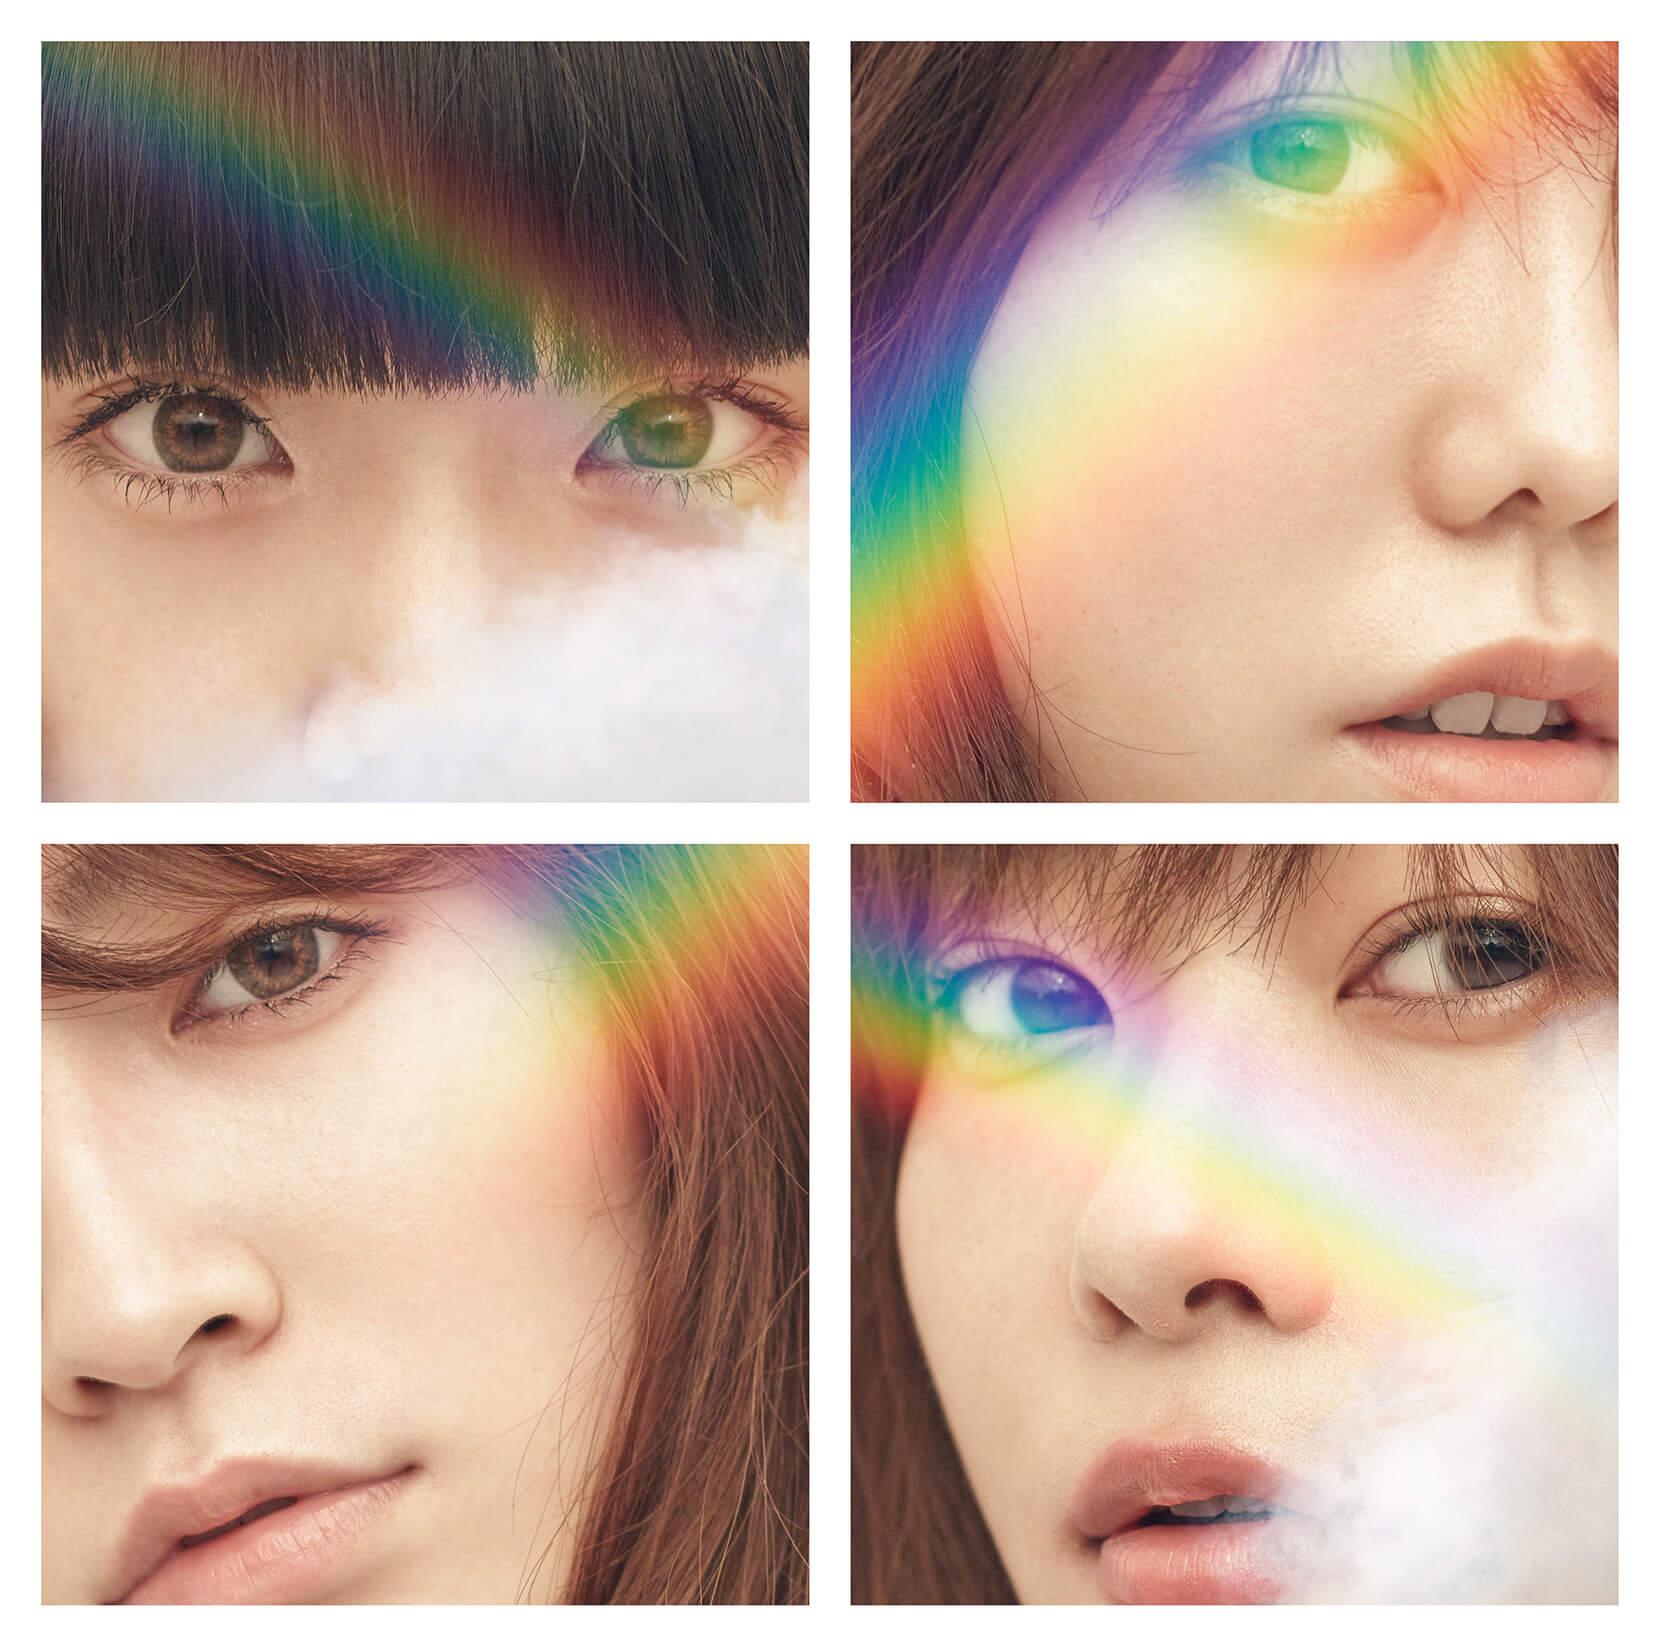 50th Single「11月のアンクレット」【劇場盤】